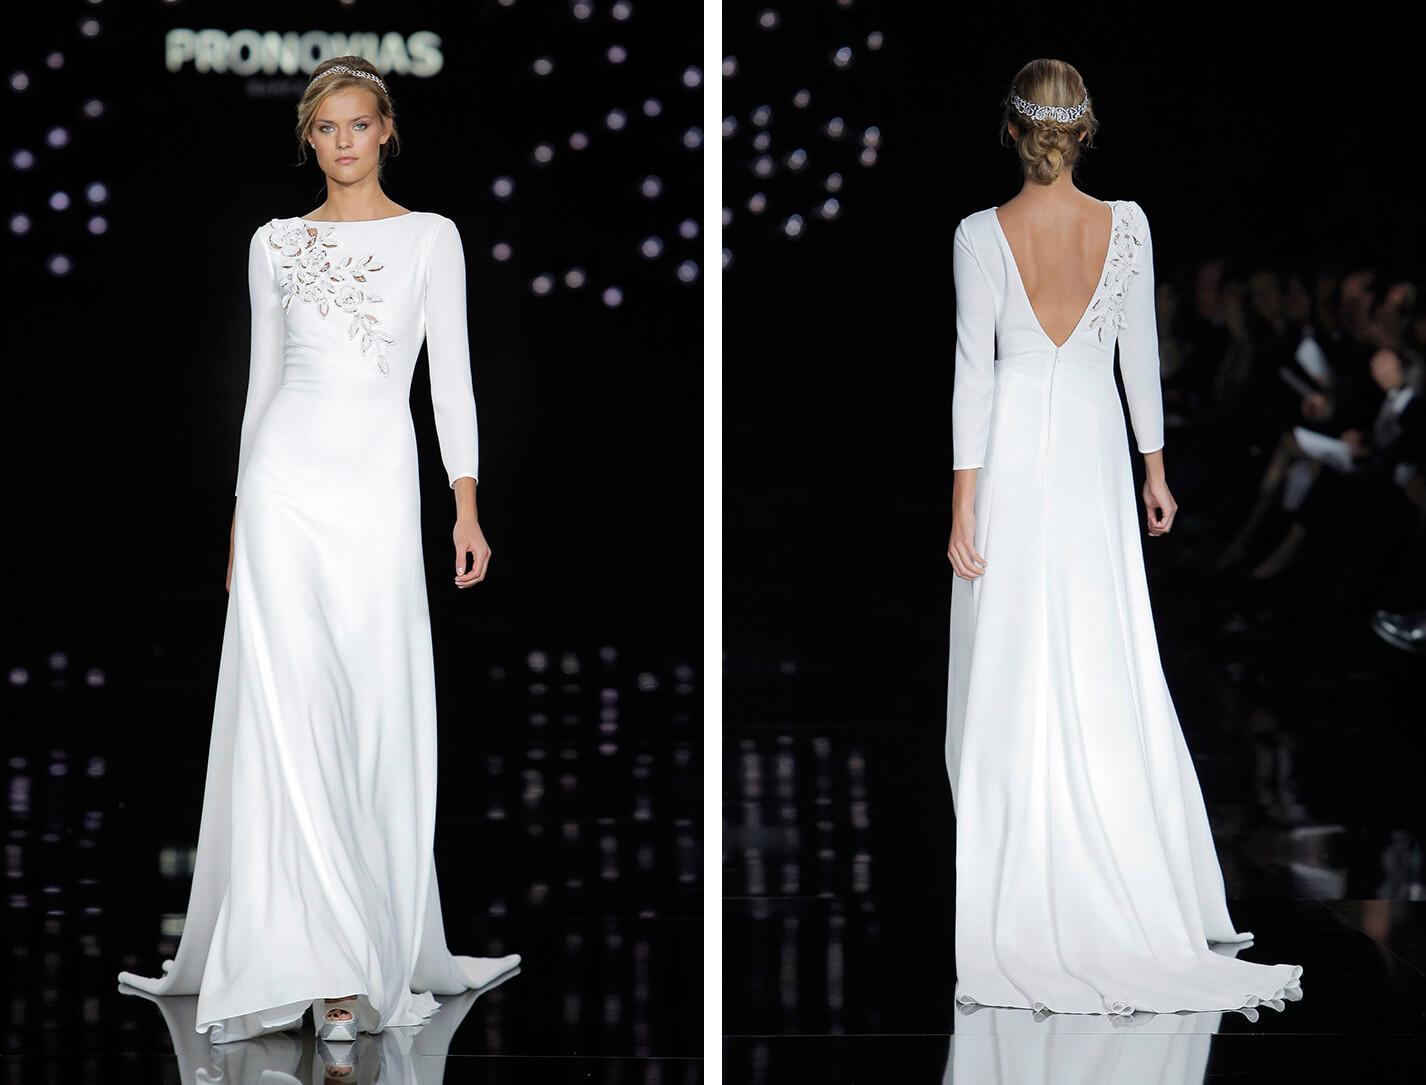 PRONOVIAS_Fashion_Show_2017_Nagore